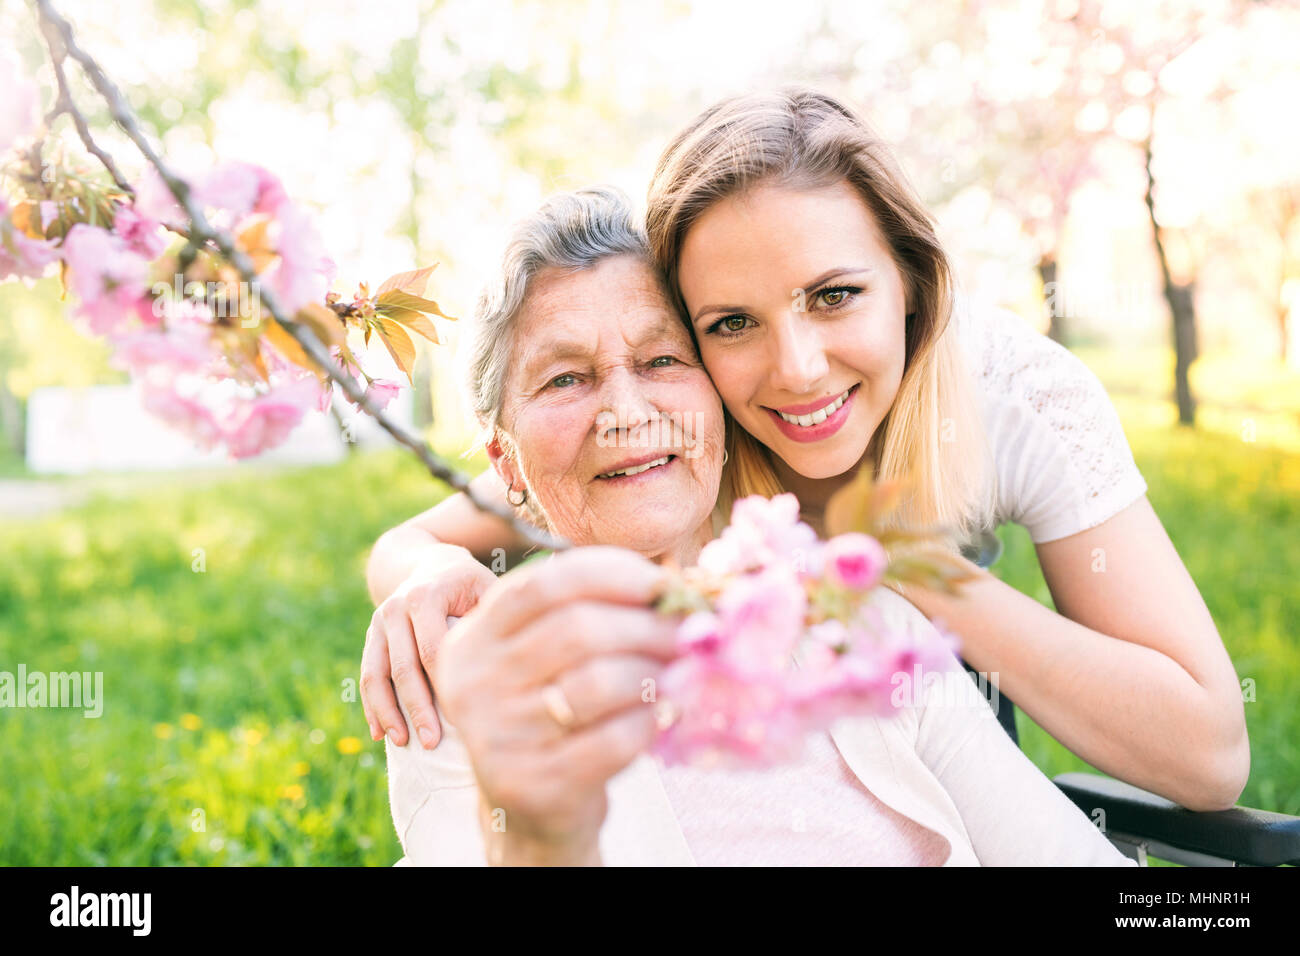 Ältere Großmutter im Rollstuhl mit Enkelin im Frühjahr die Natur. Stockbild